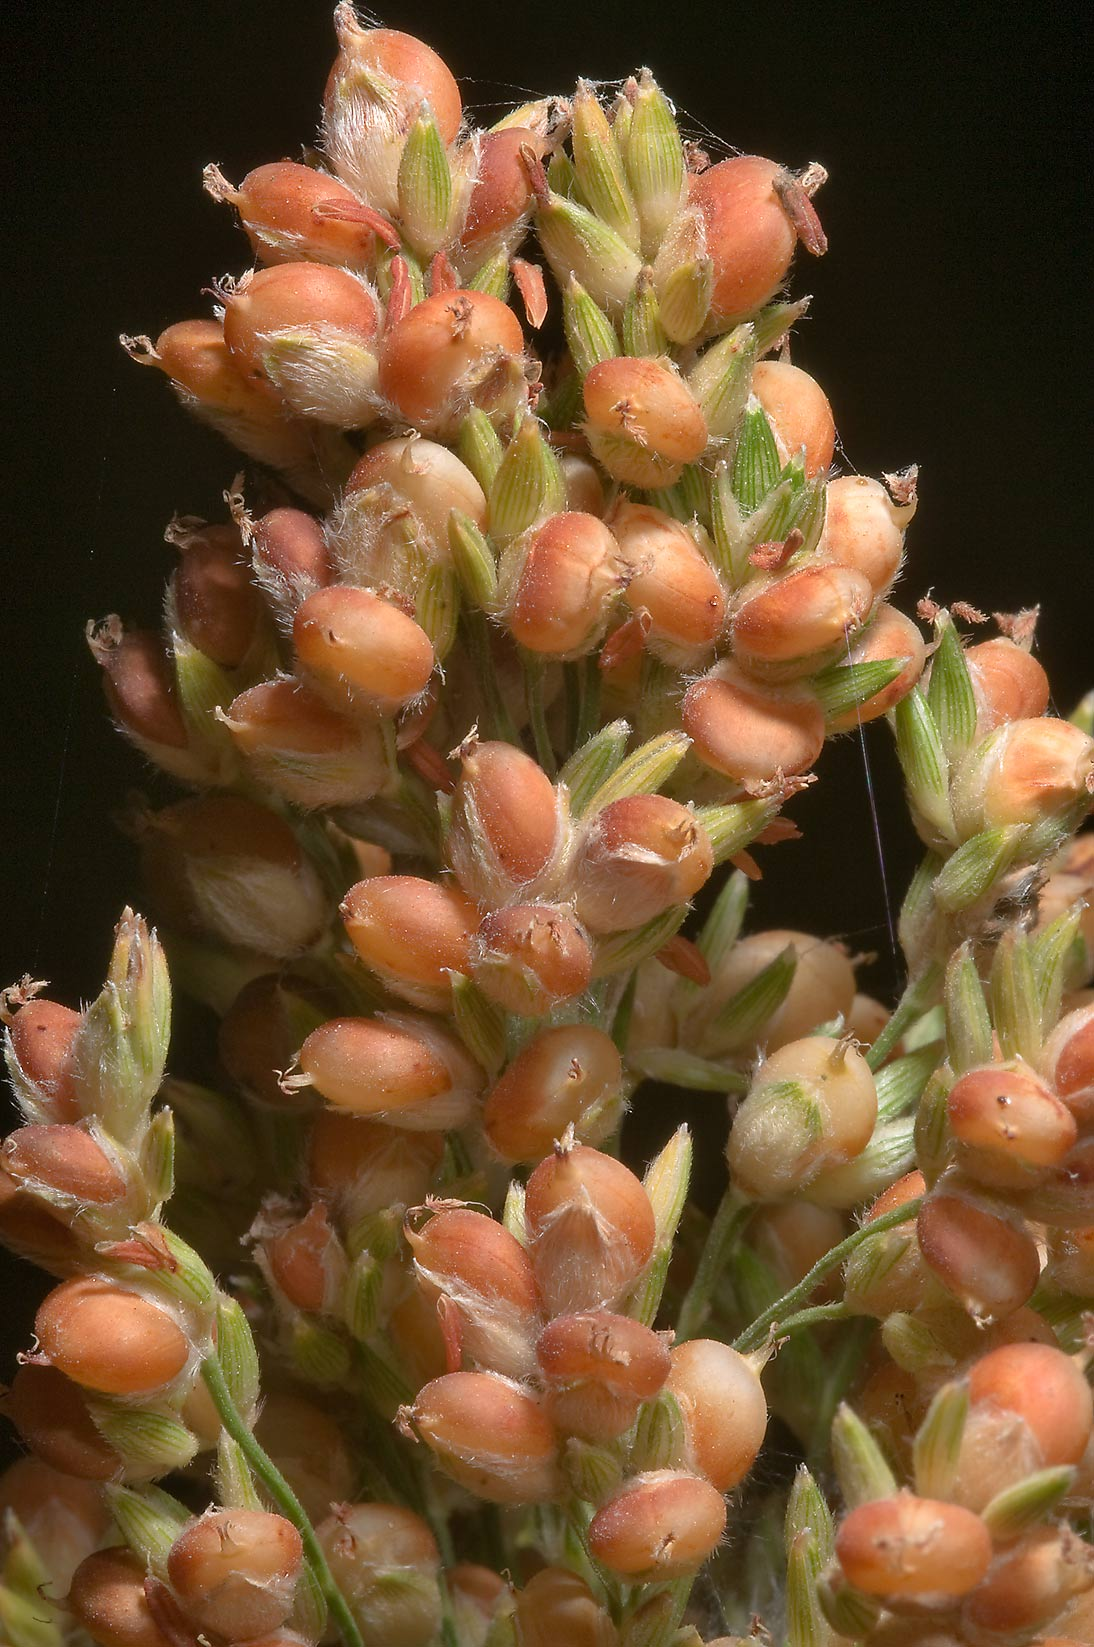 Photo 896-05: Sorghum-like plant in TAMU Horticultural ...